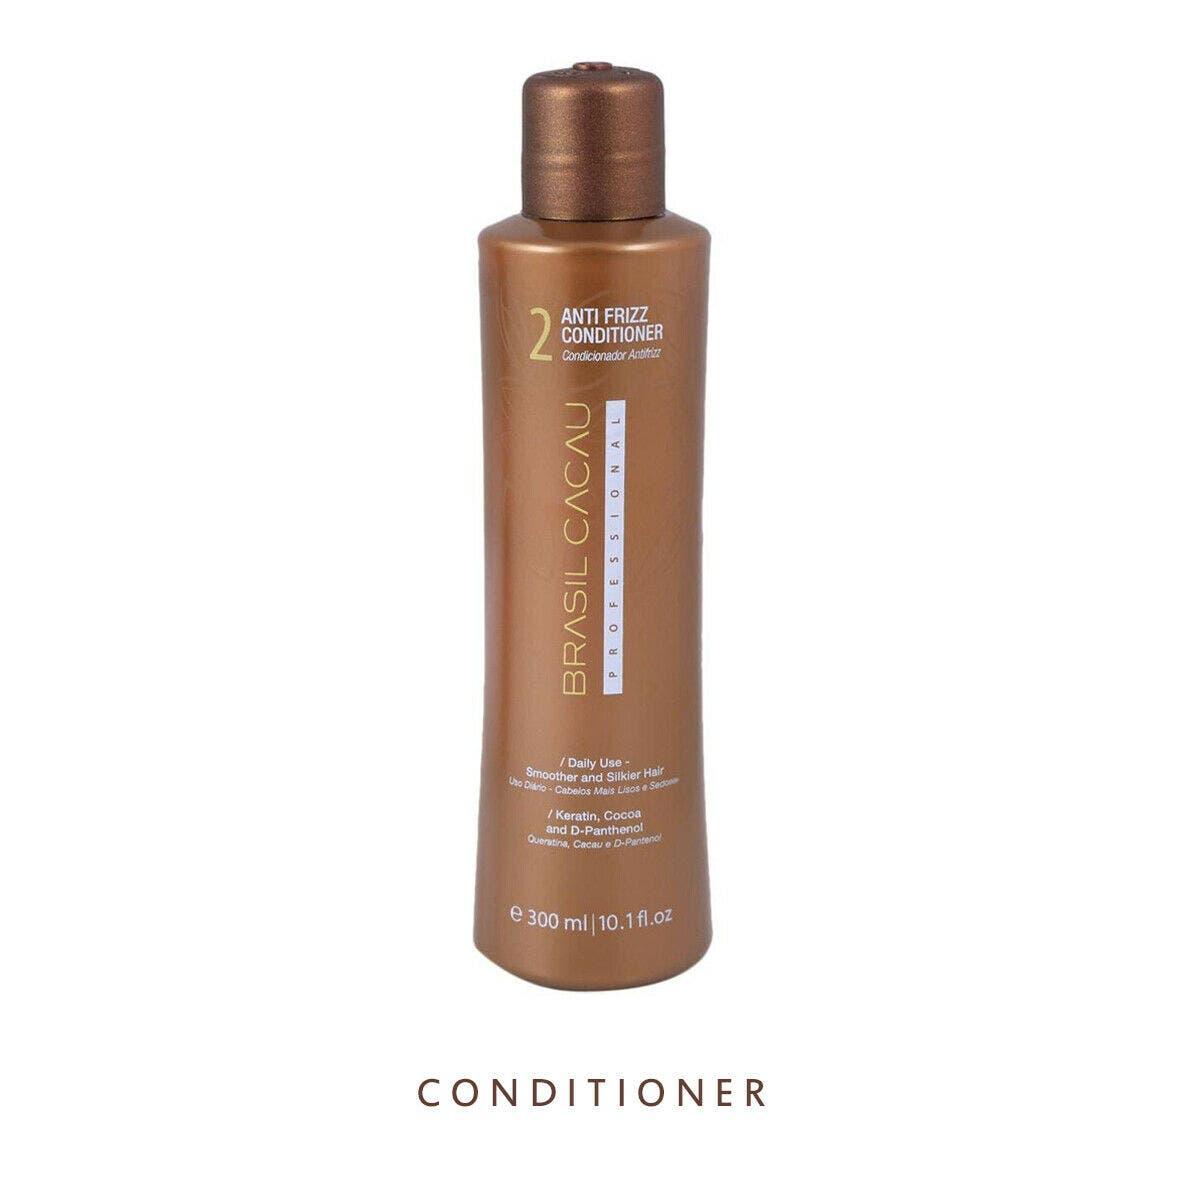 Brasil Cacau ANTI FRIZZ 300ml Conditioner For Damaged Hair